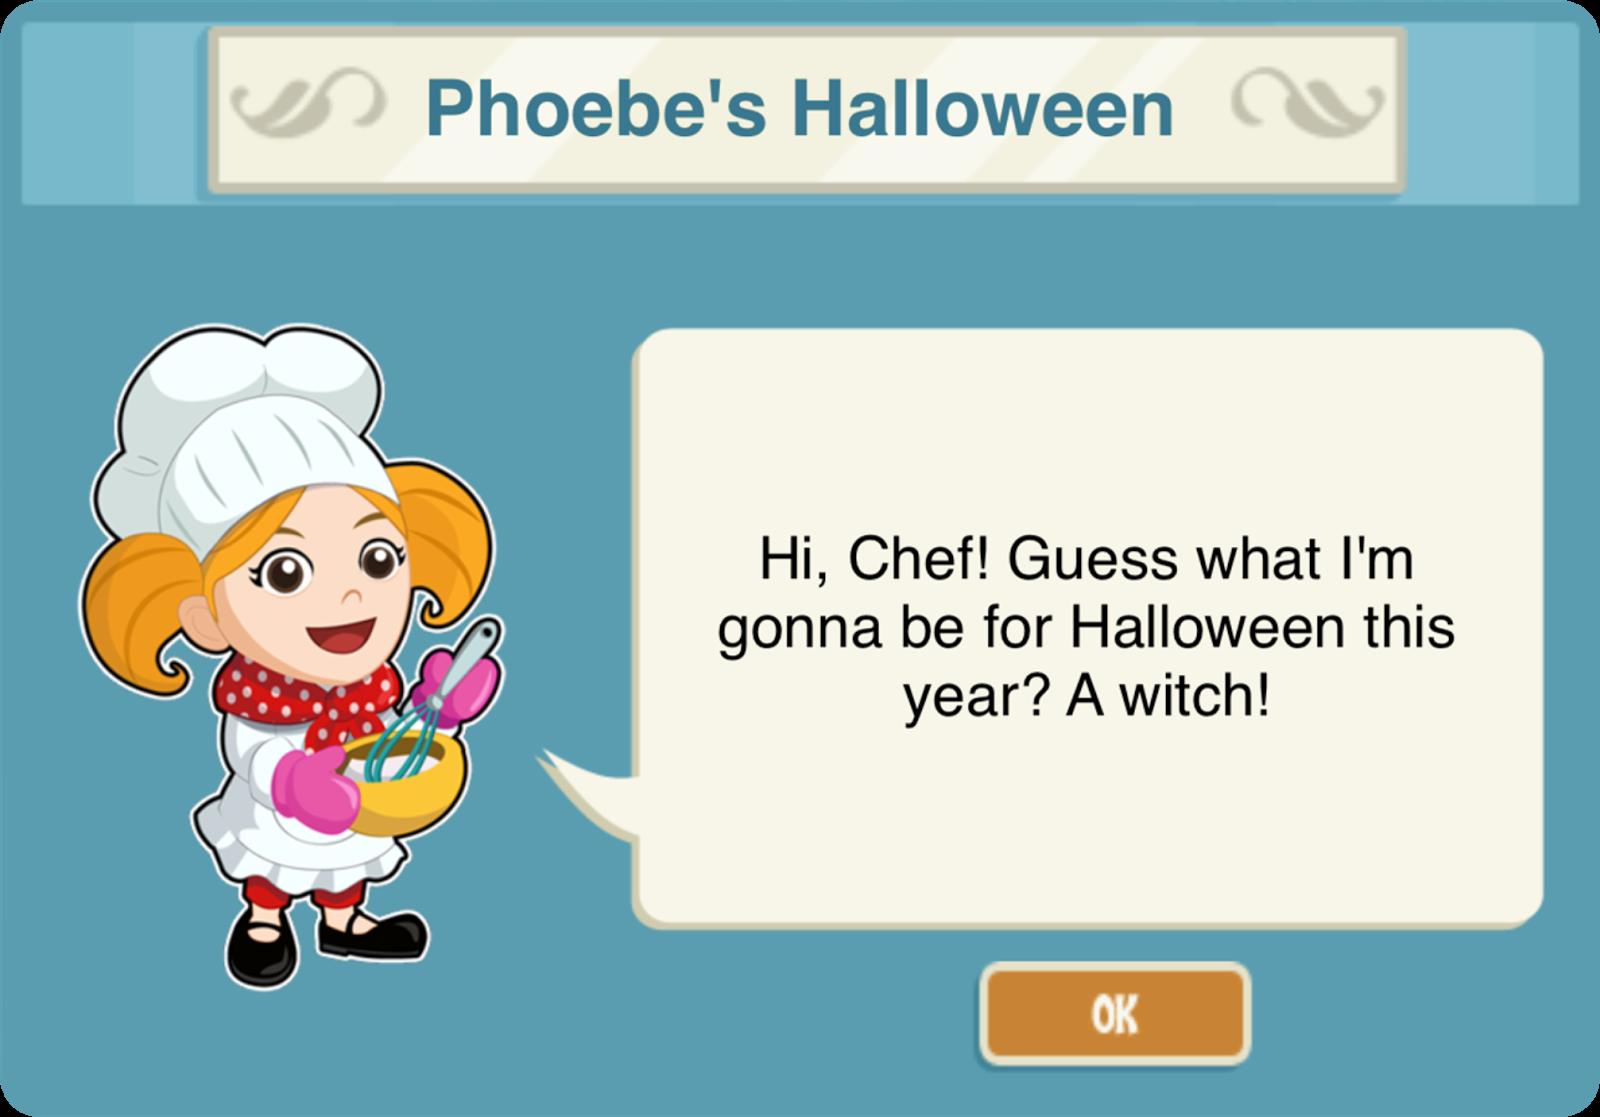 Restaurant Story Adventures: Game update: 14/10/15